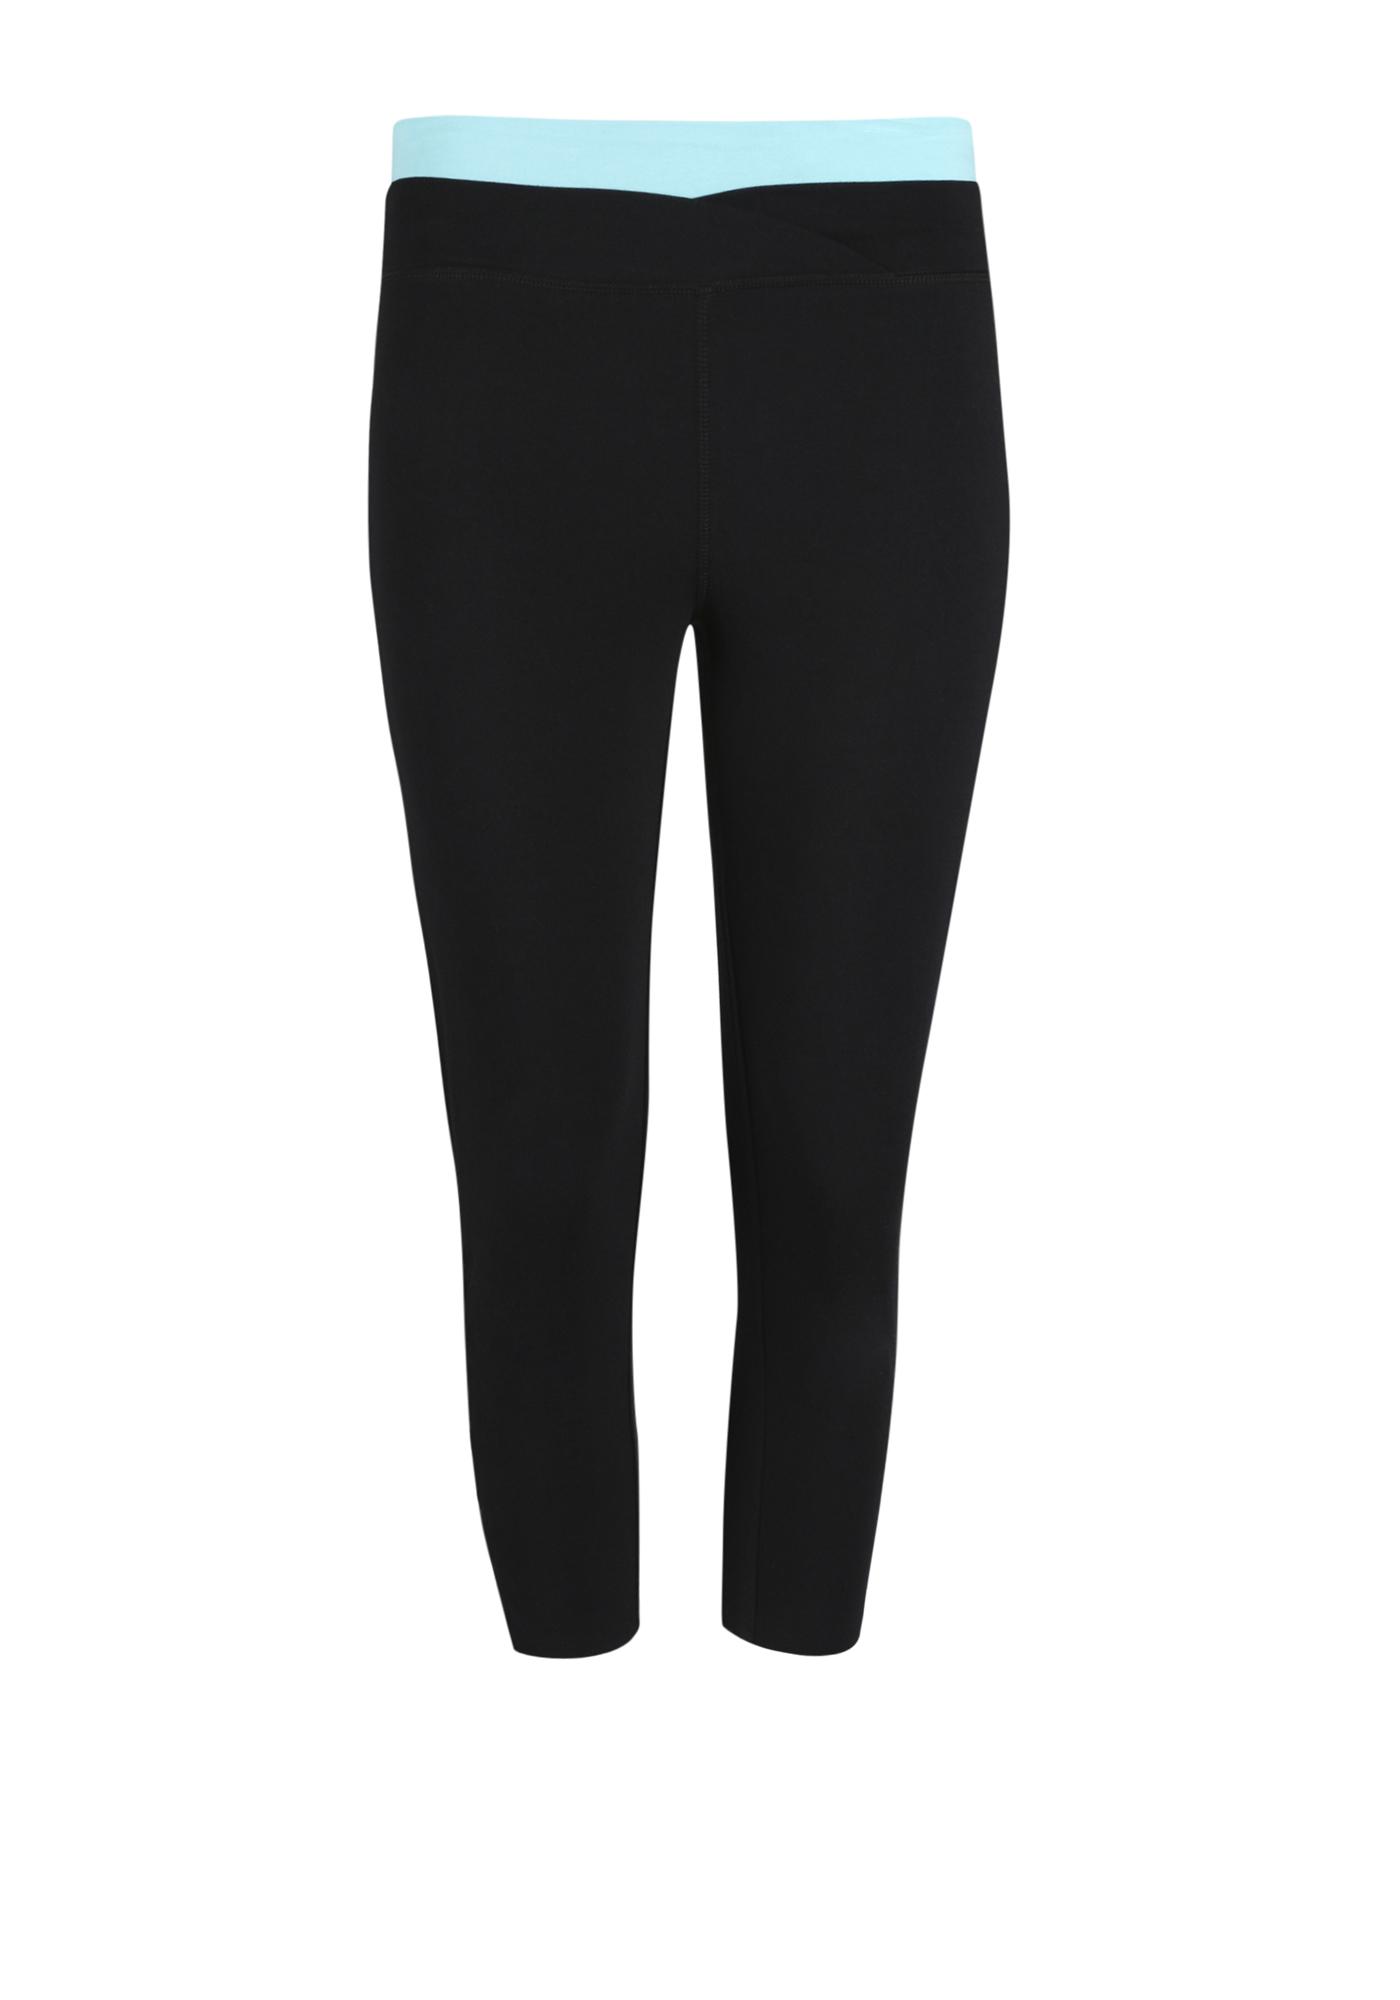 2a16450a20e96 Women's Contrast Capri Legging | Warehouse One